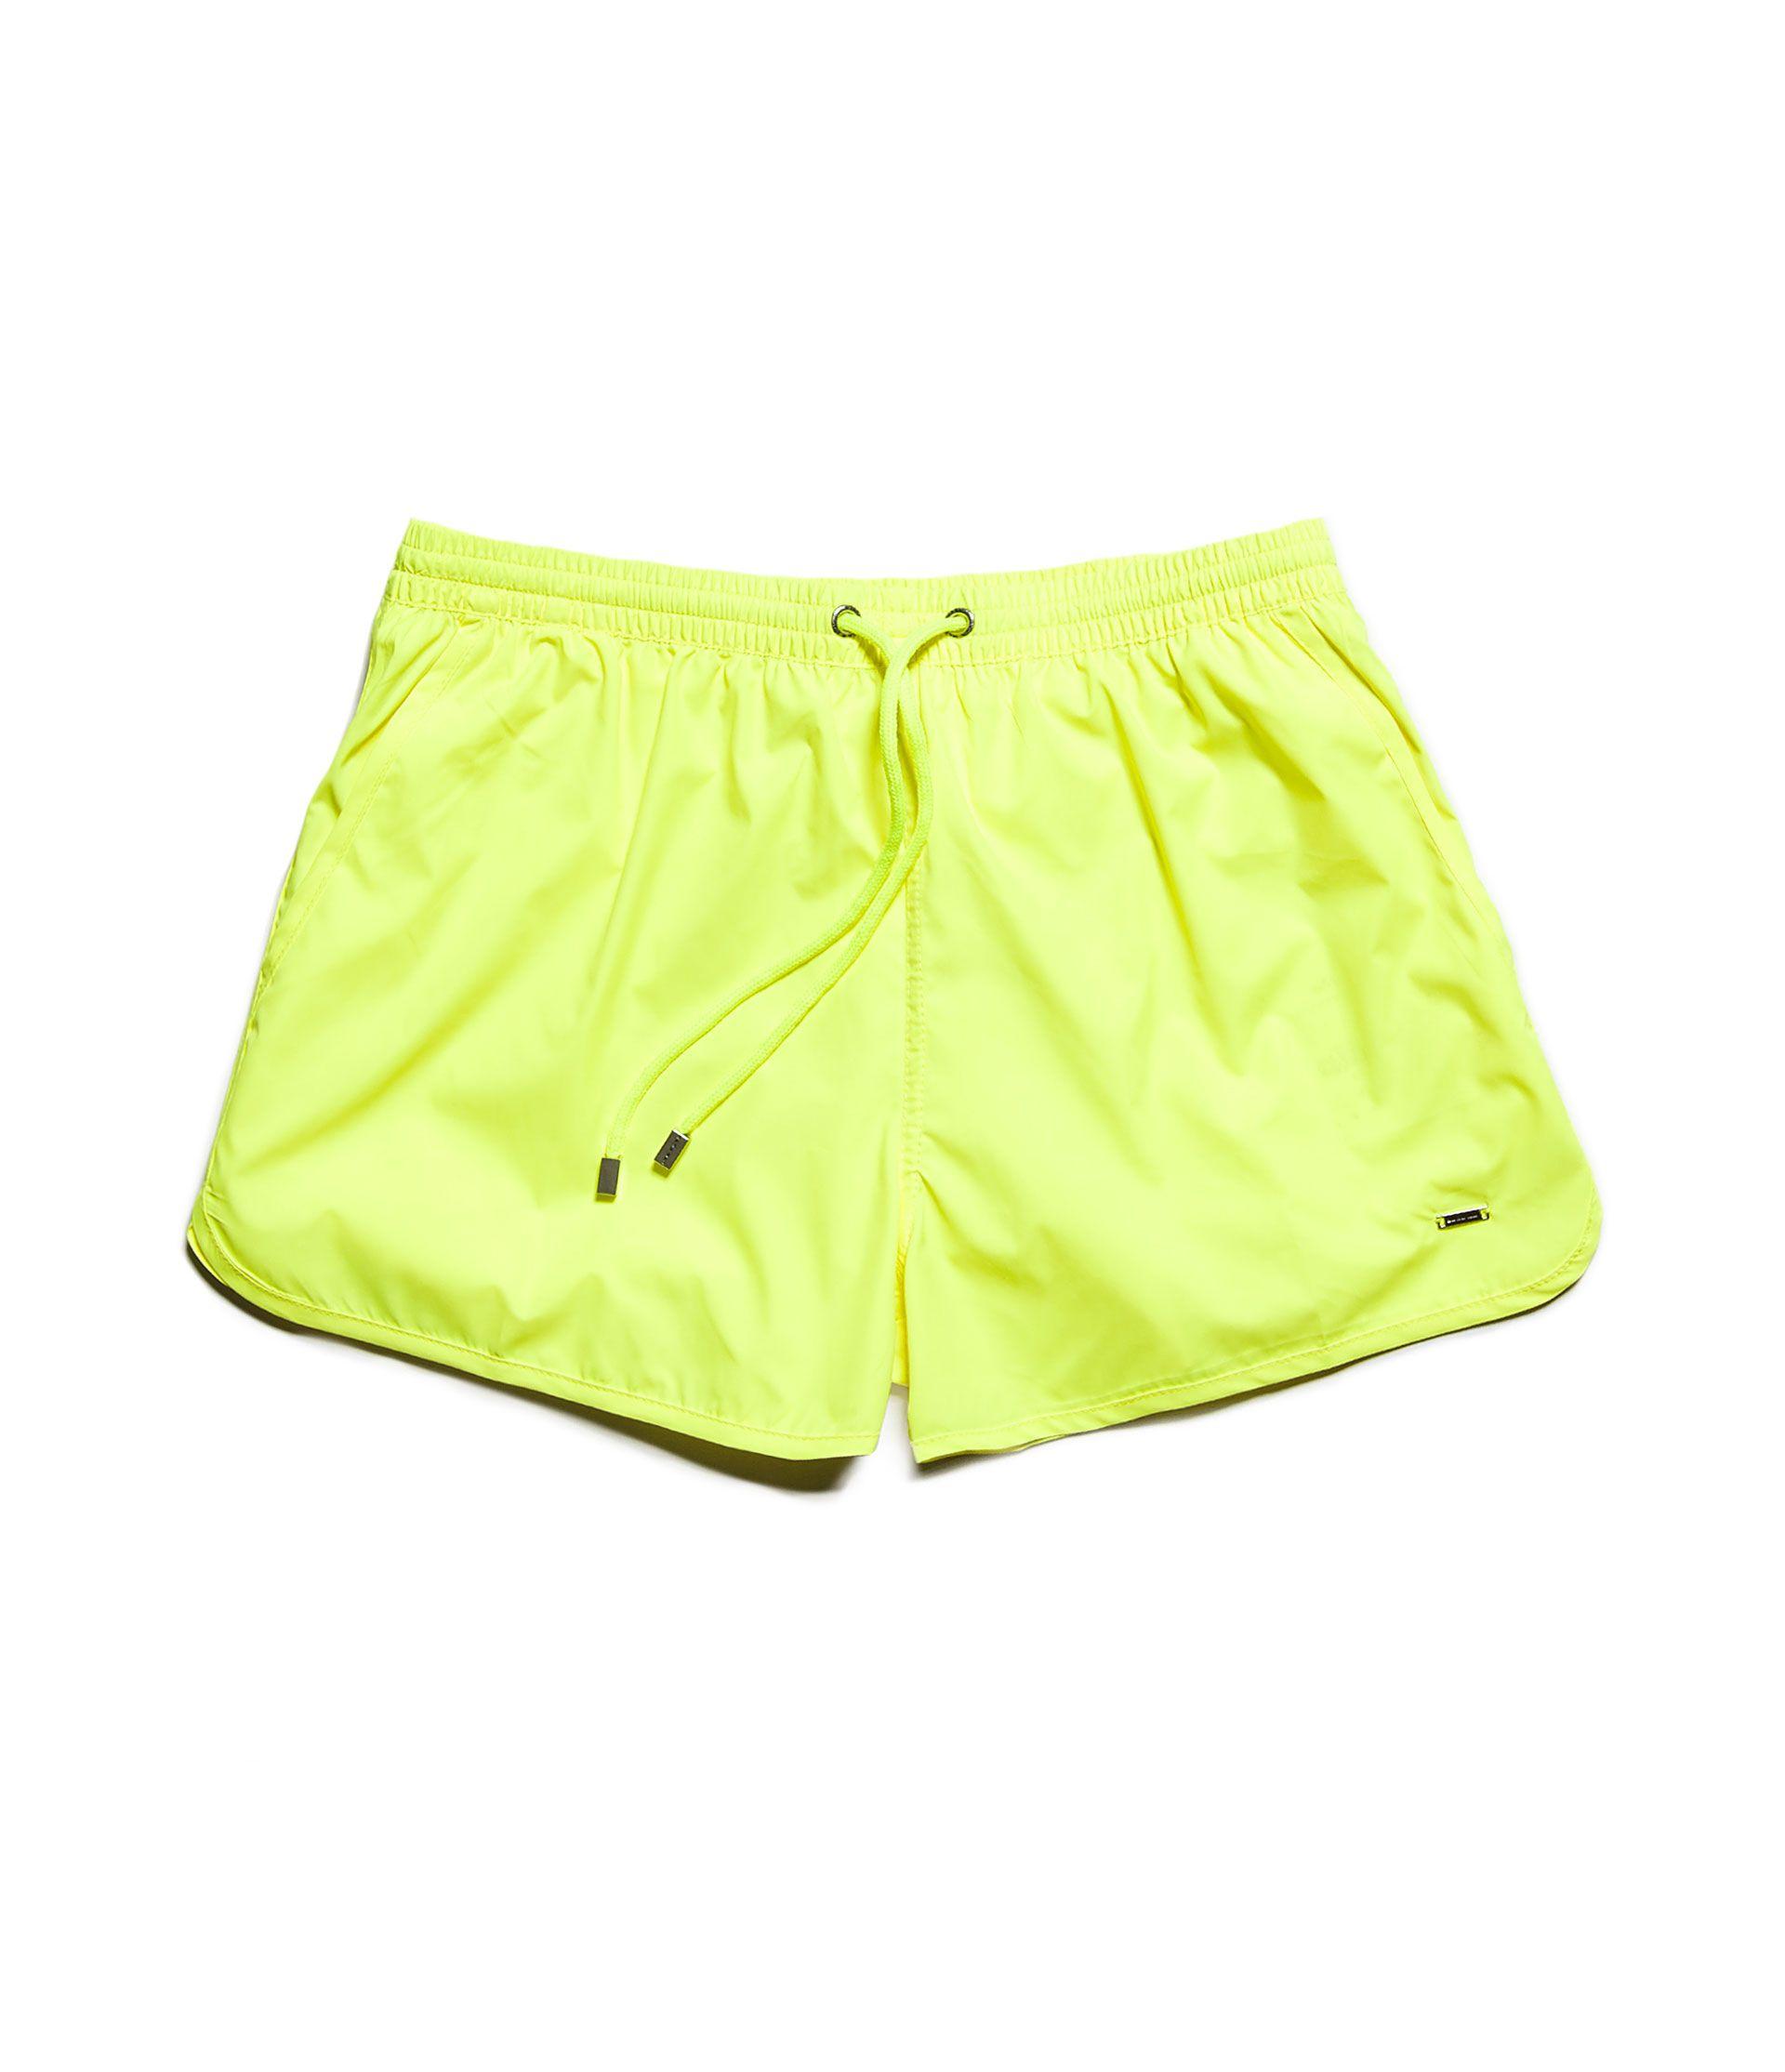 Zara swim shorts   Neon   Pinterest